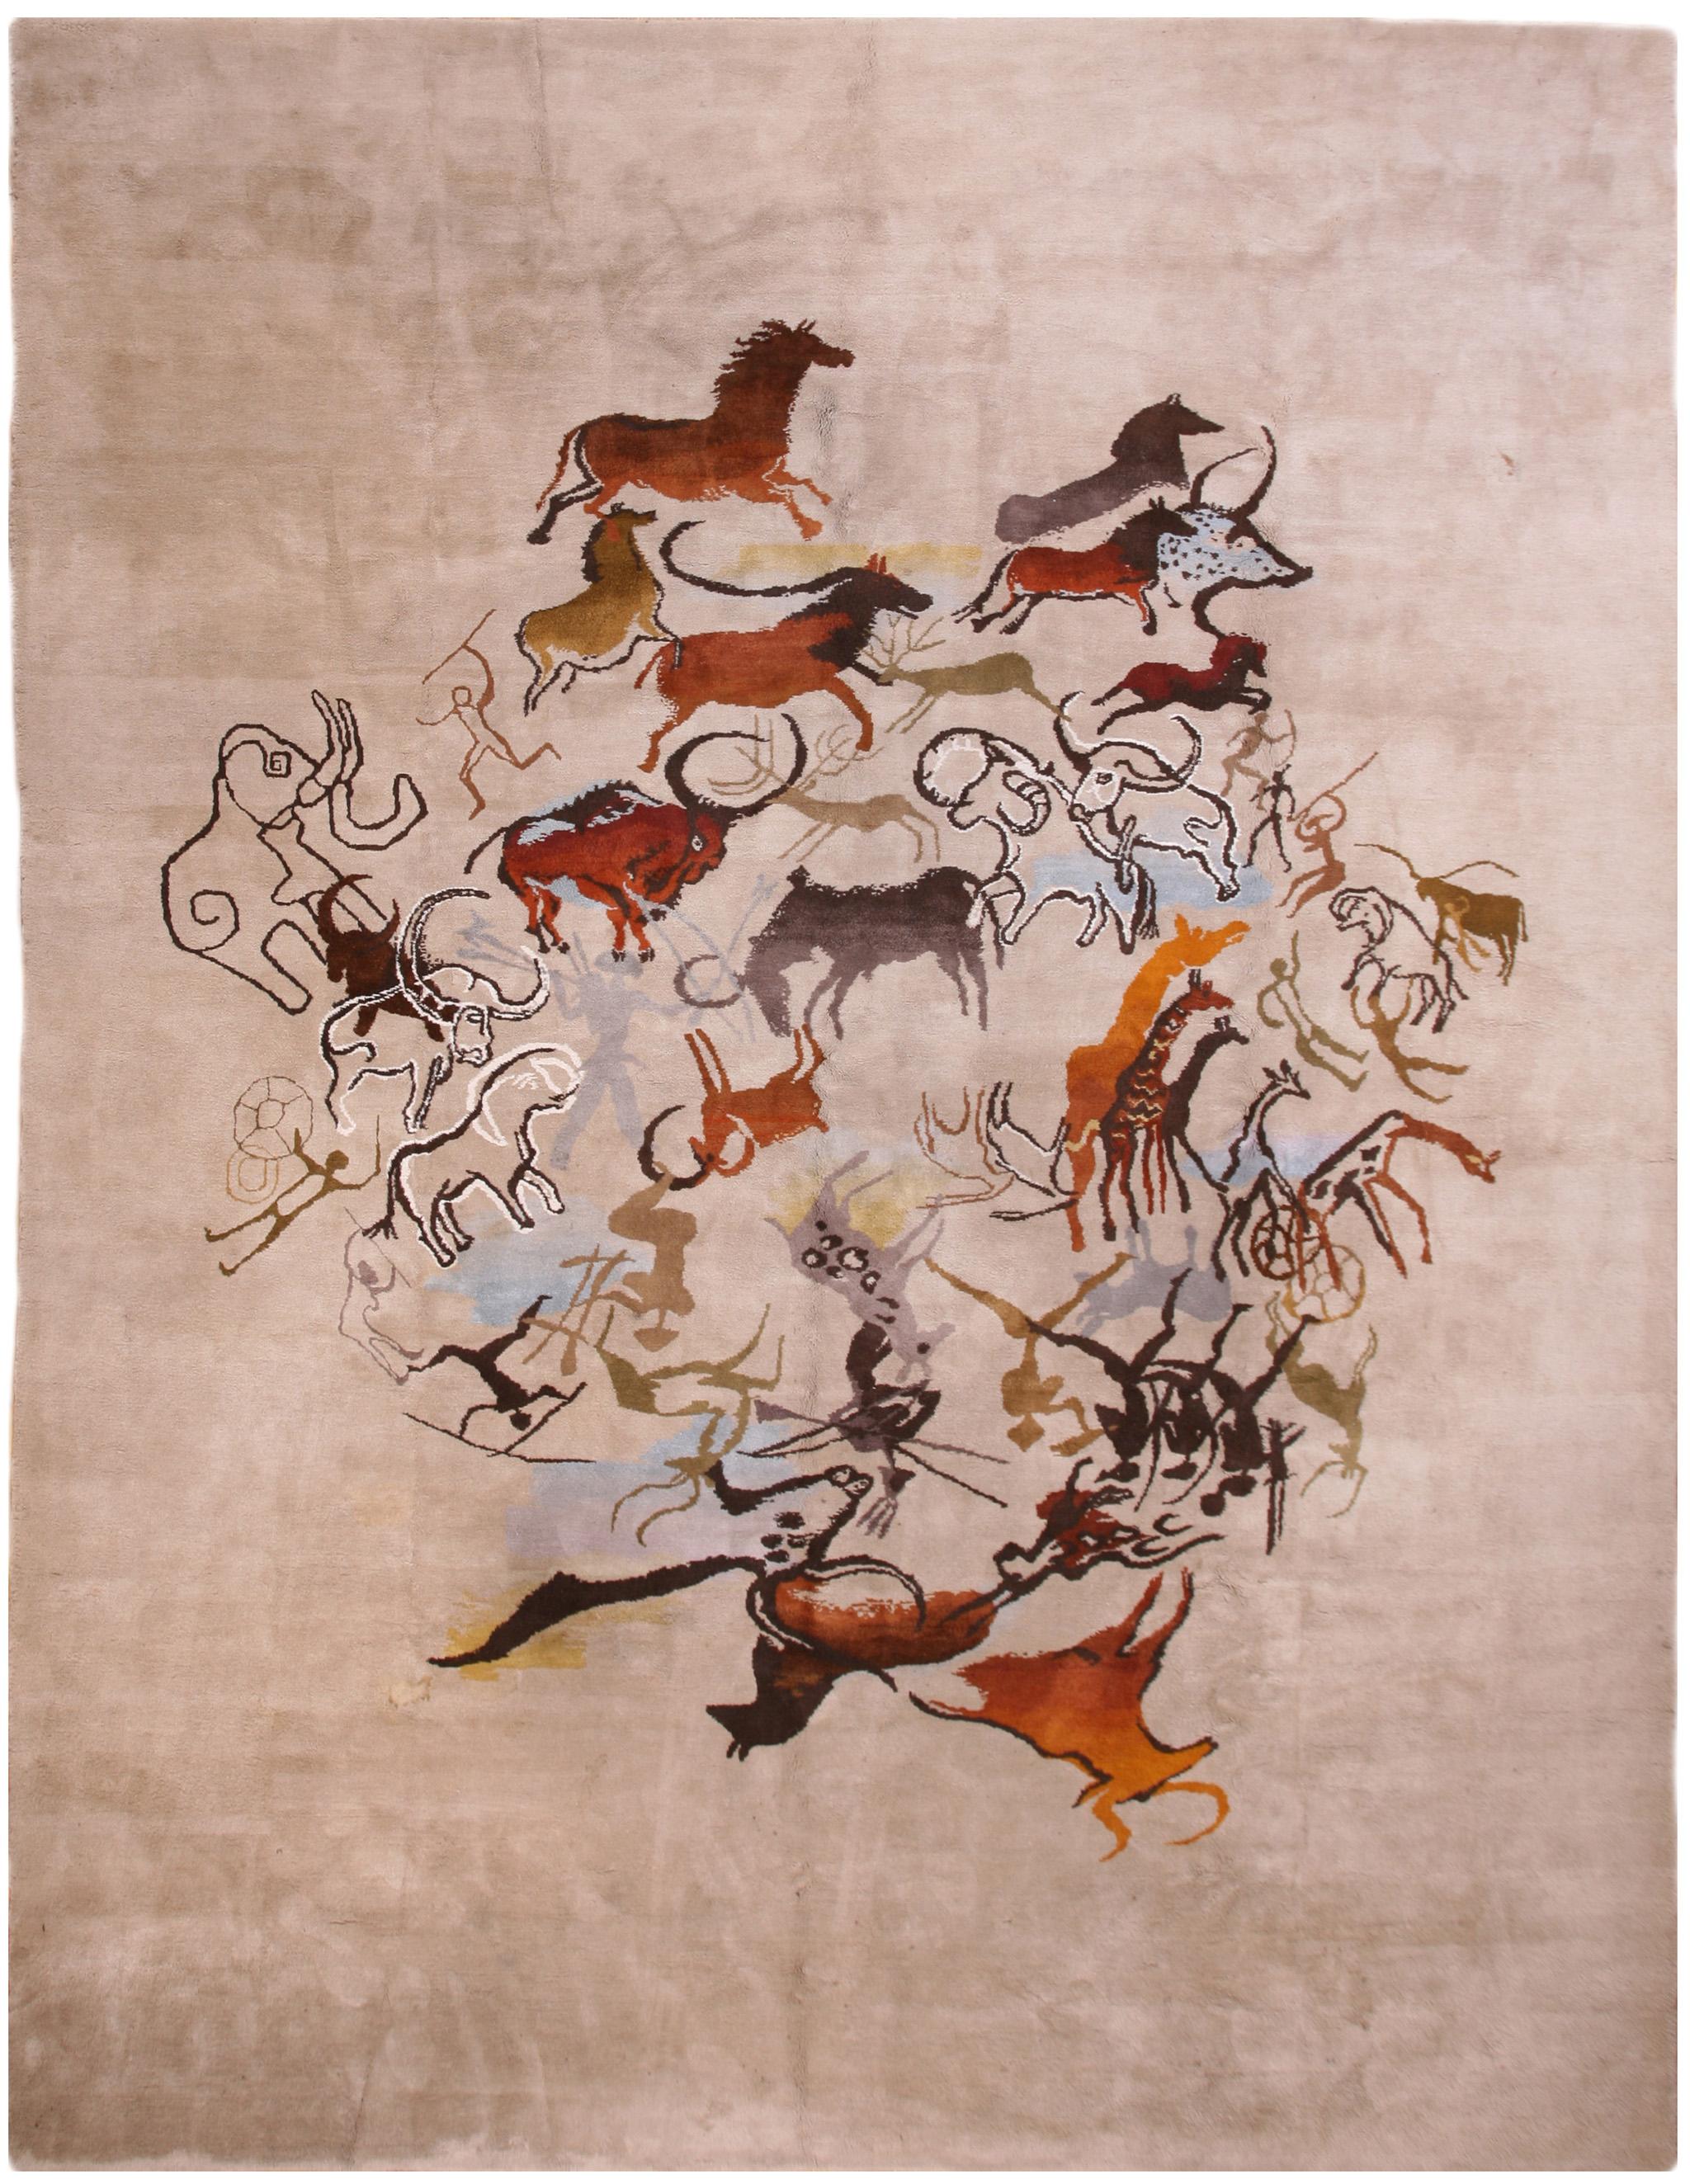 'Caverna' by Olga Fisch. Ecuadorian carpet, circa 1950. | Image courtesy of Rahmanan Antique and Decorative Rugs.